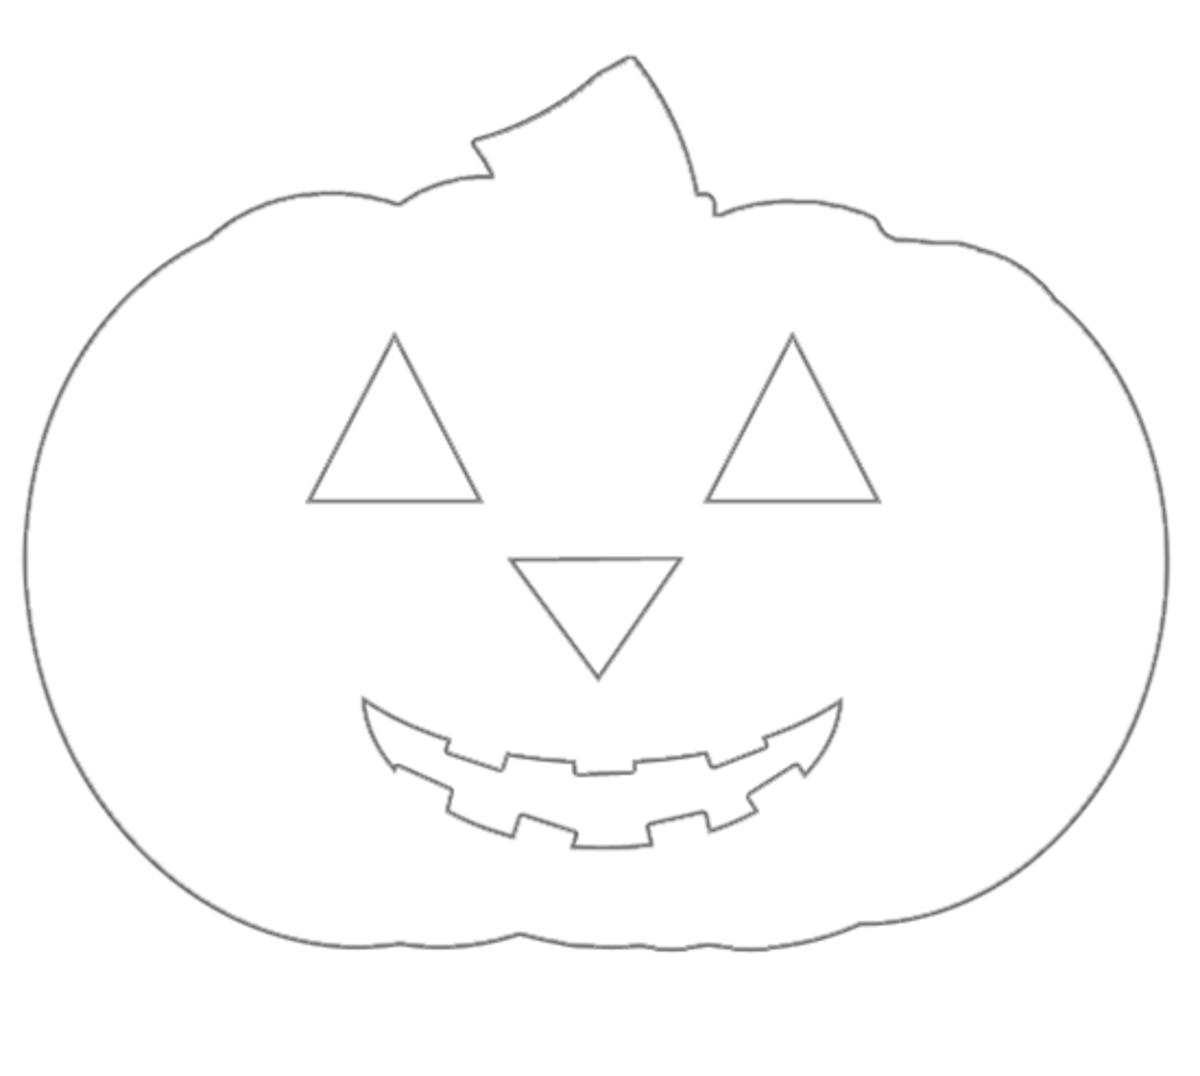 A jack-o-lantern printable Halloween coloring image.